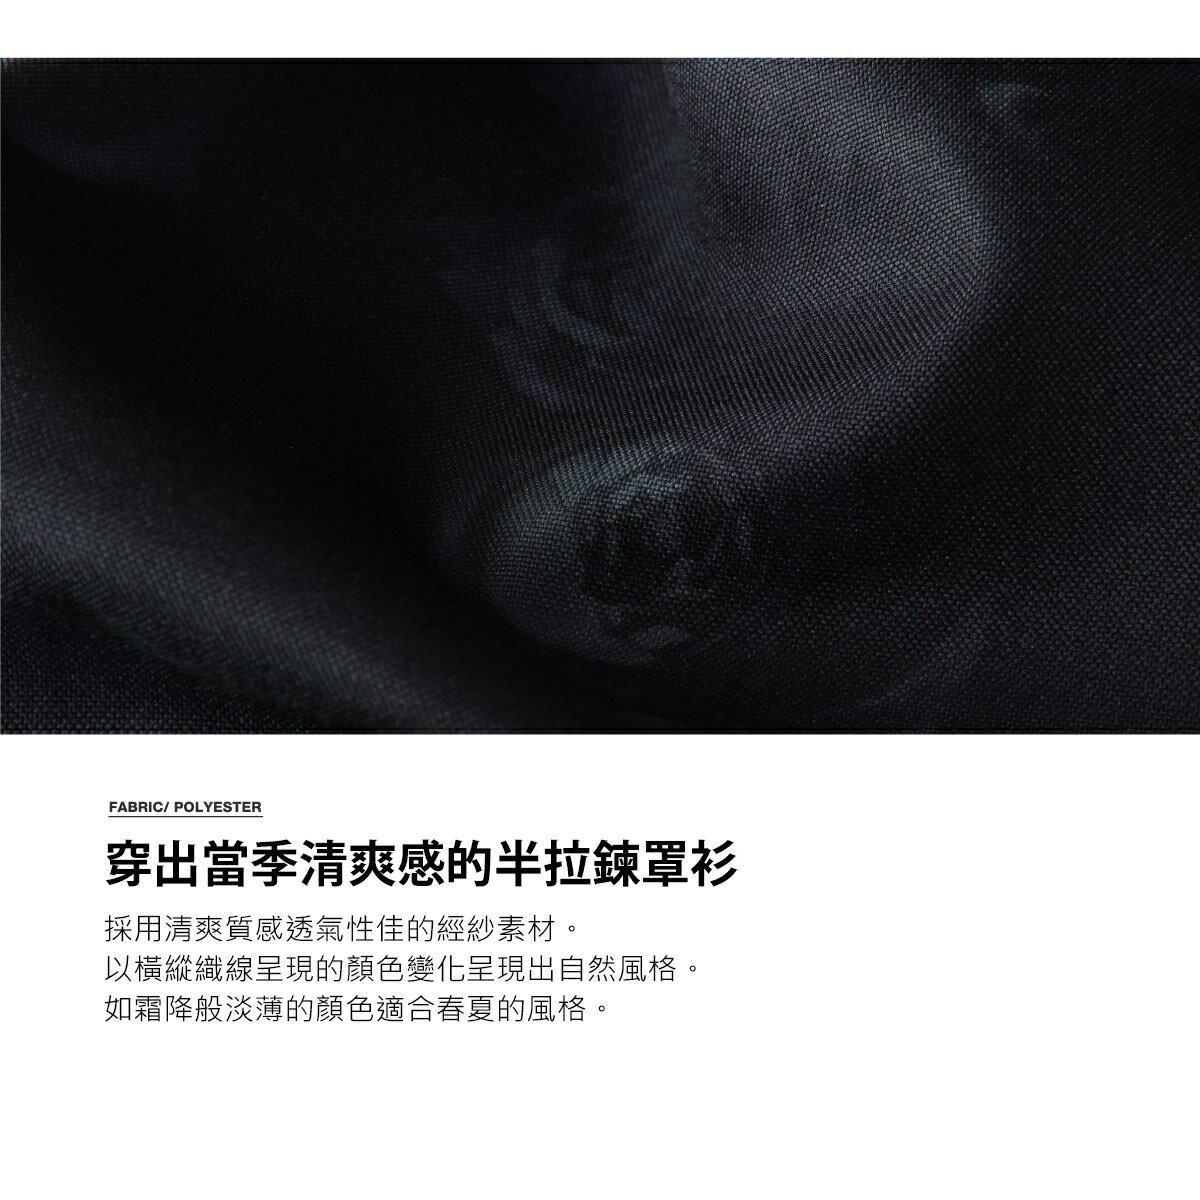 【ZIP】半拉鍊套頭衫 短袖 ZIP FIVE 襯衫 短袖 春裝 7